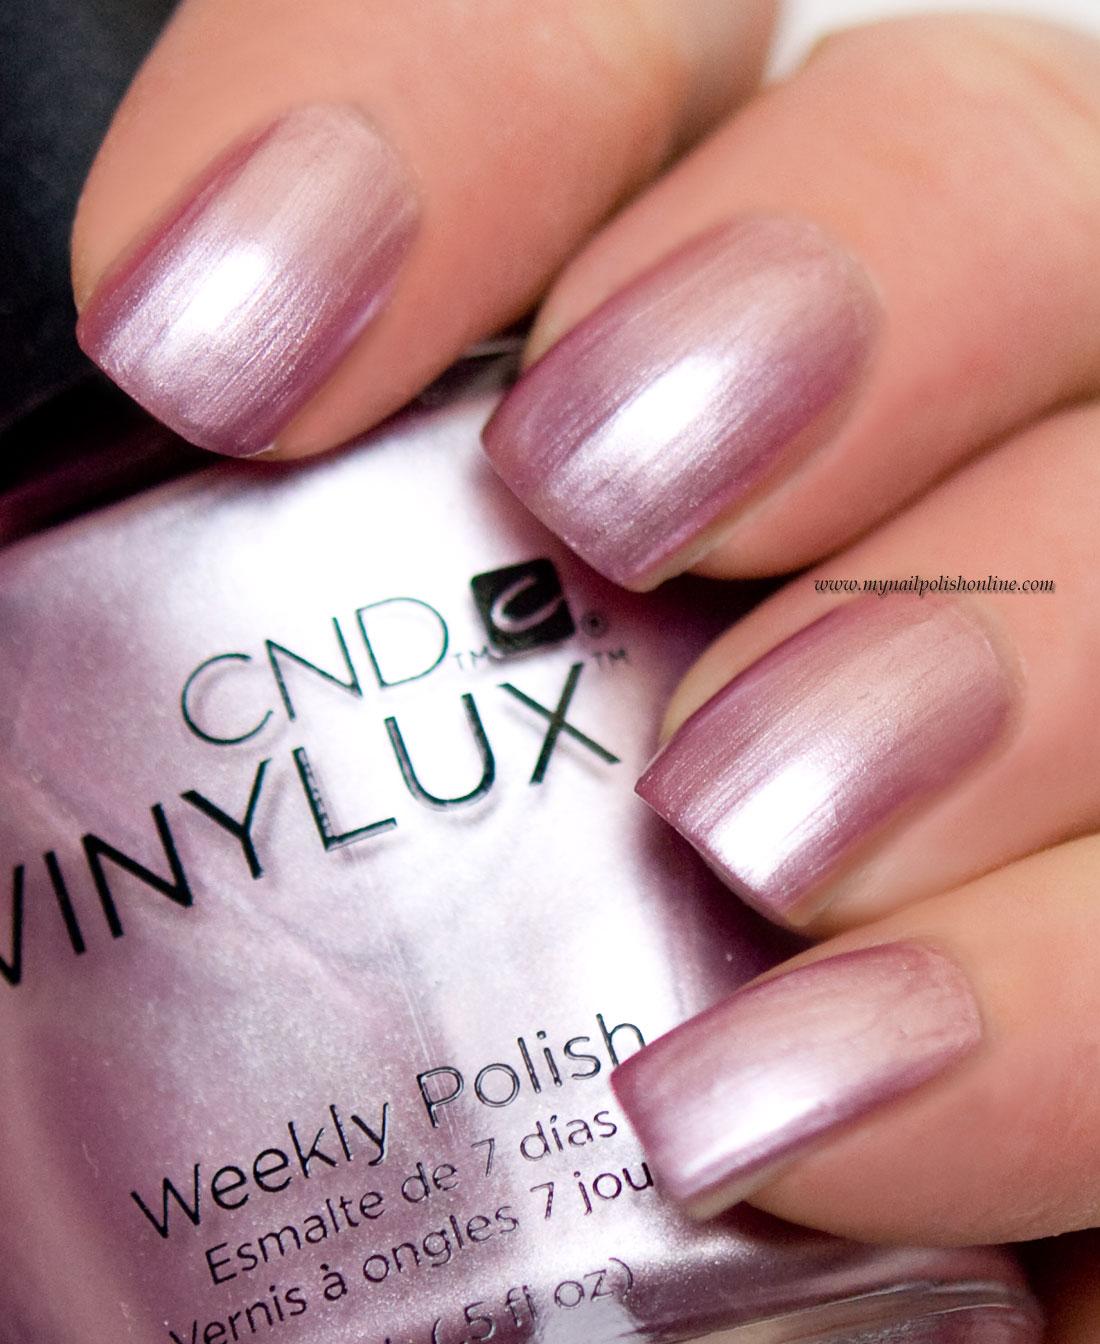 CND Vinylux - Tundra - My Nail Polish Online